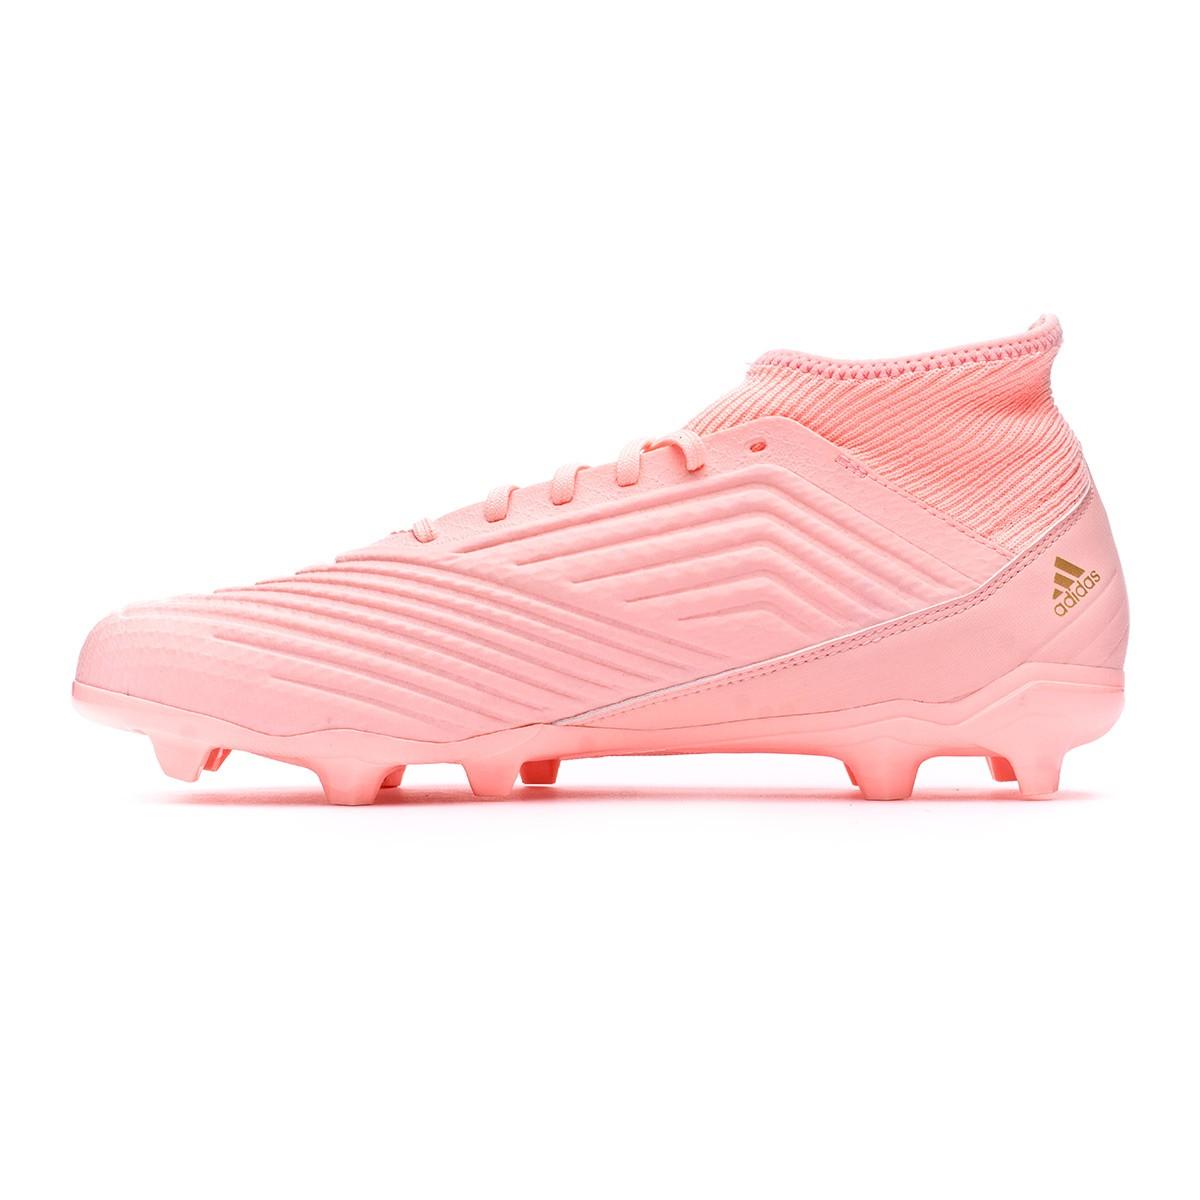 2351c64a2e Football Boots adidas Predator 18.3 FG Clear orange-Trace pink - Tienda de  fútbol Fútbol Emotion